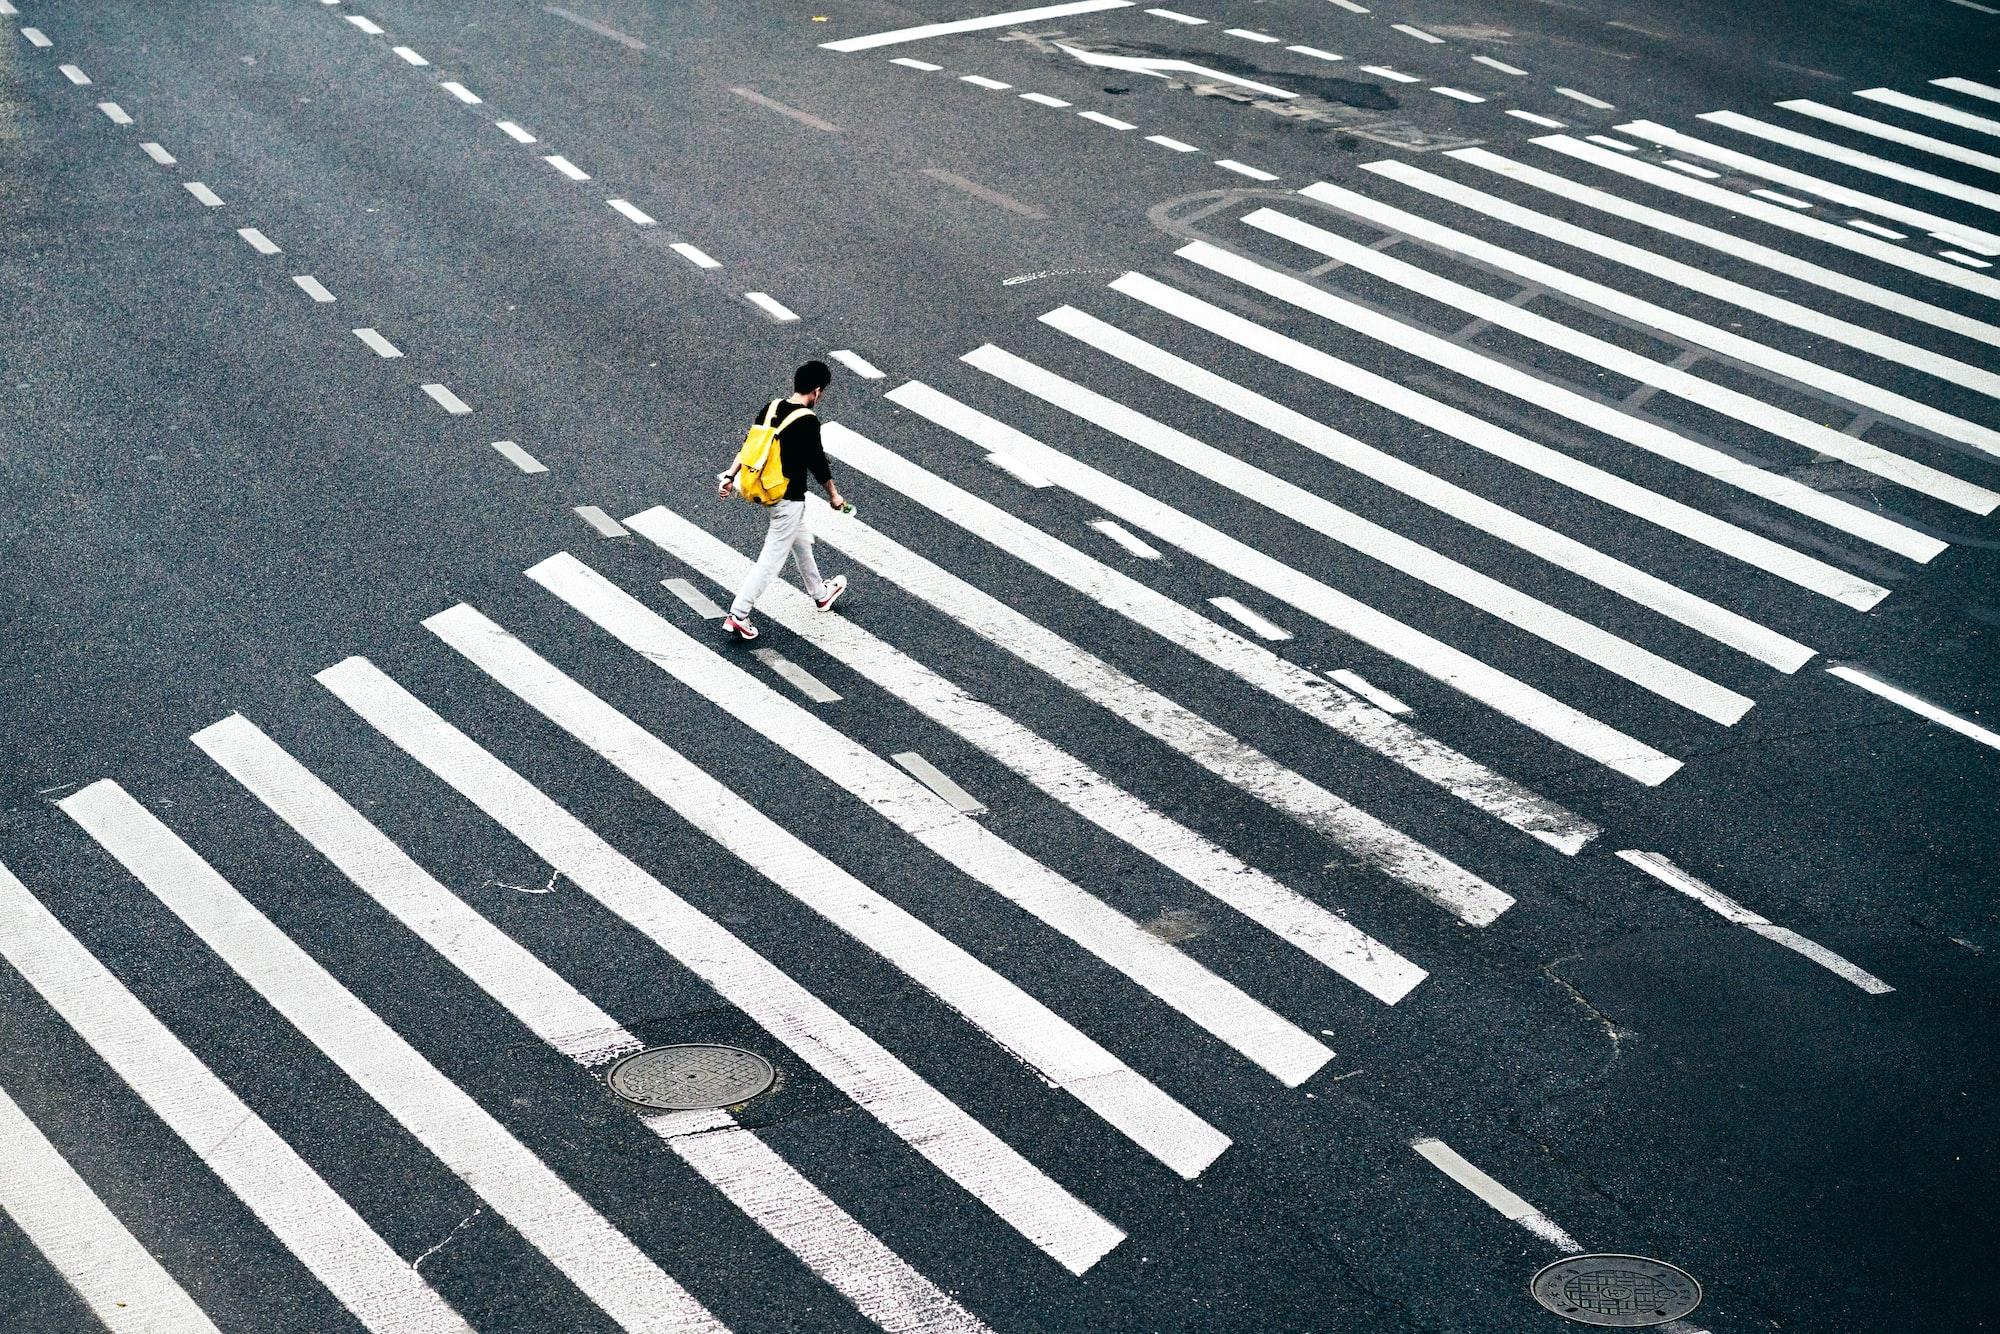 Realizing I'm walking so little | Daily #192